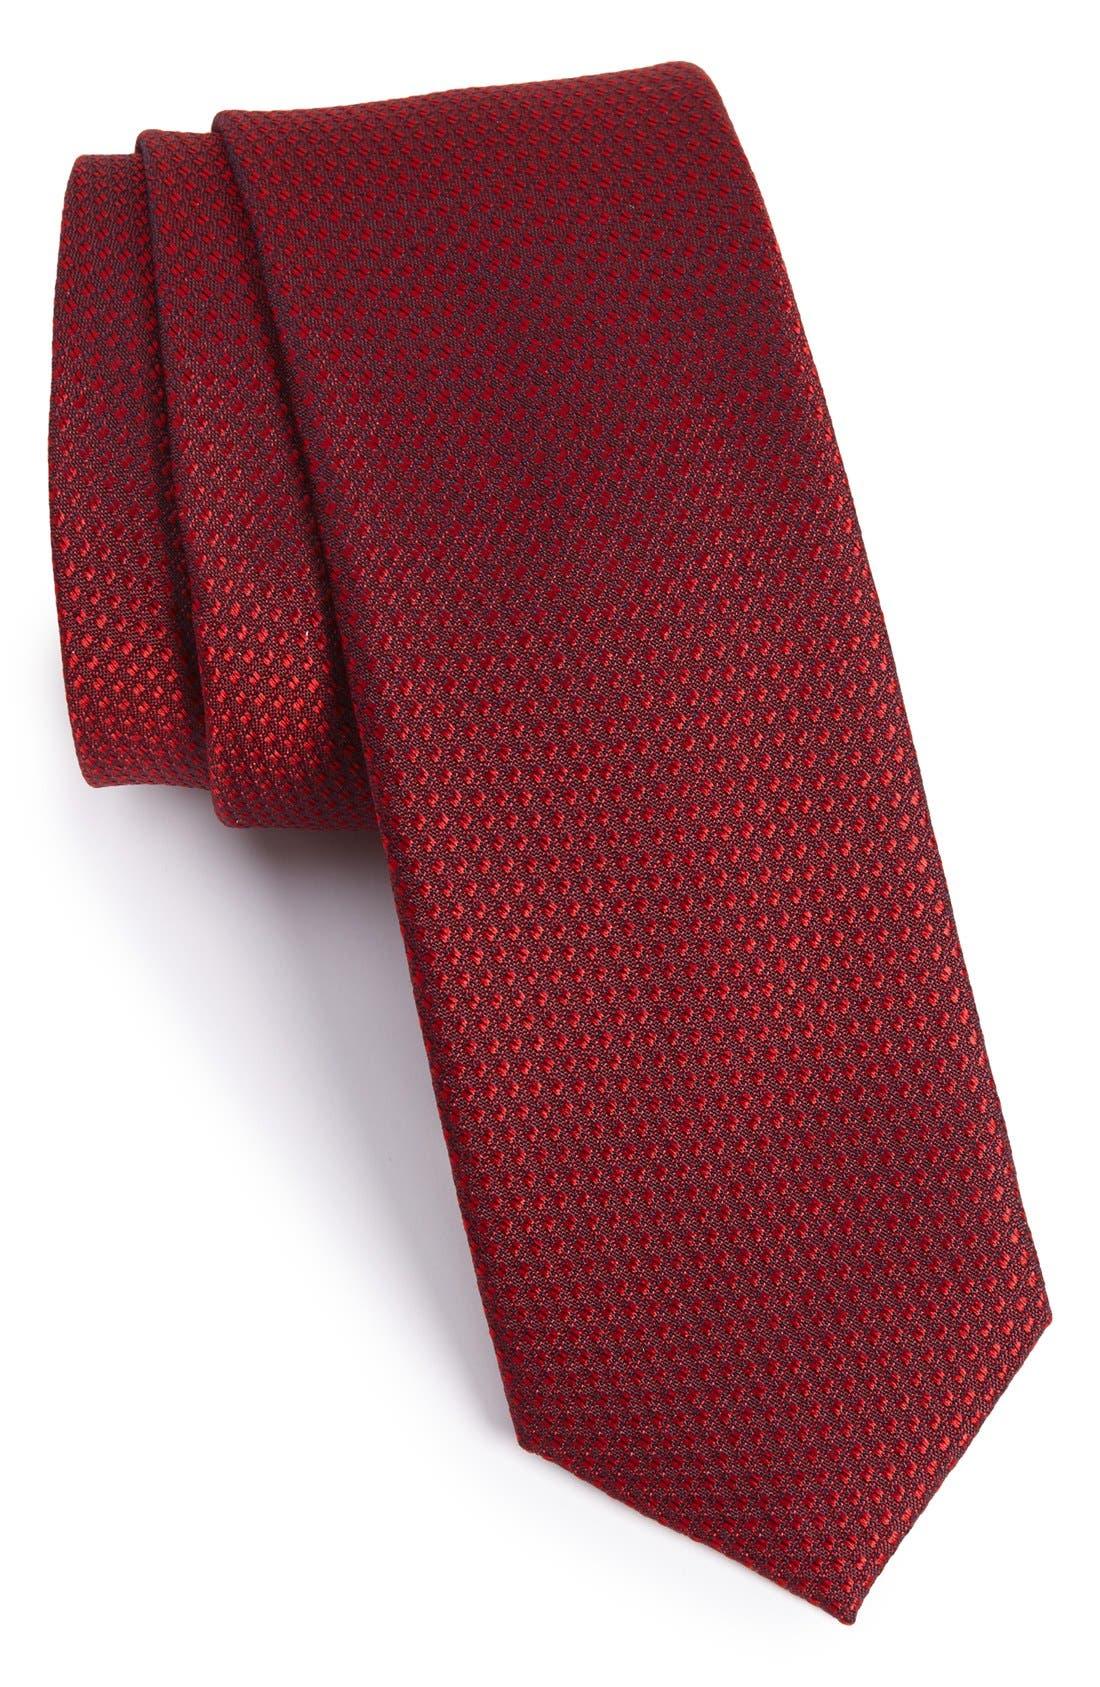 Main Image - Calibrate Seattle Textured Silk Tie